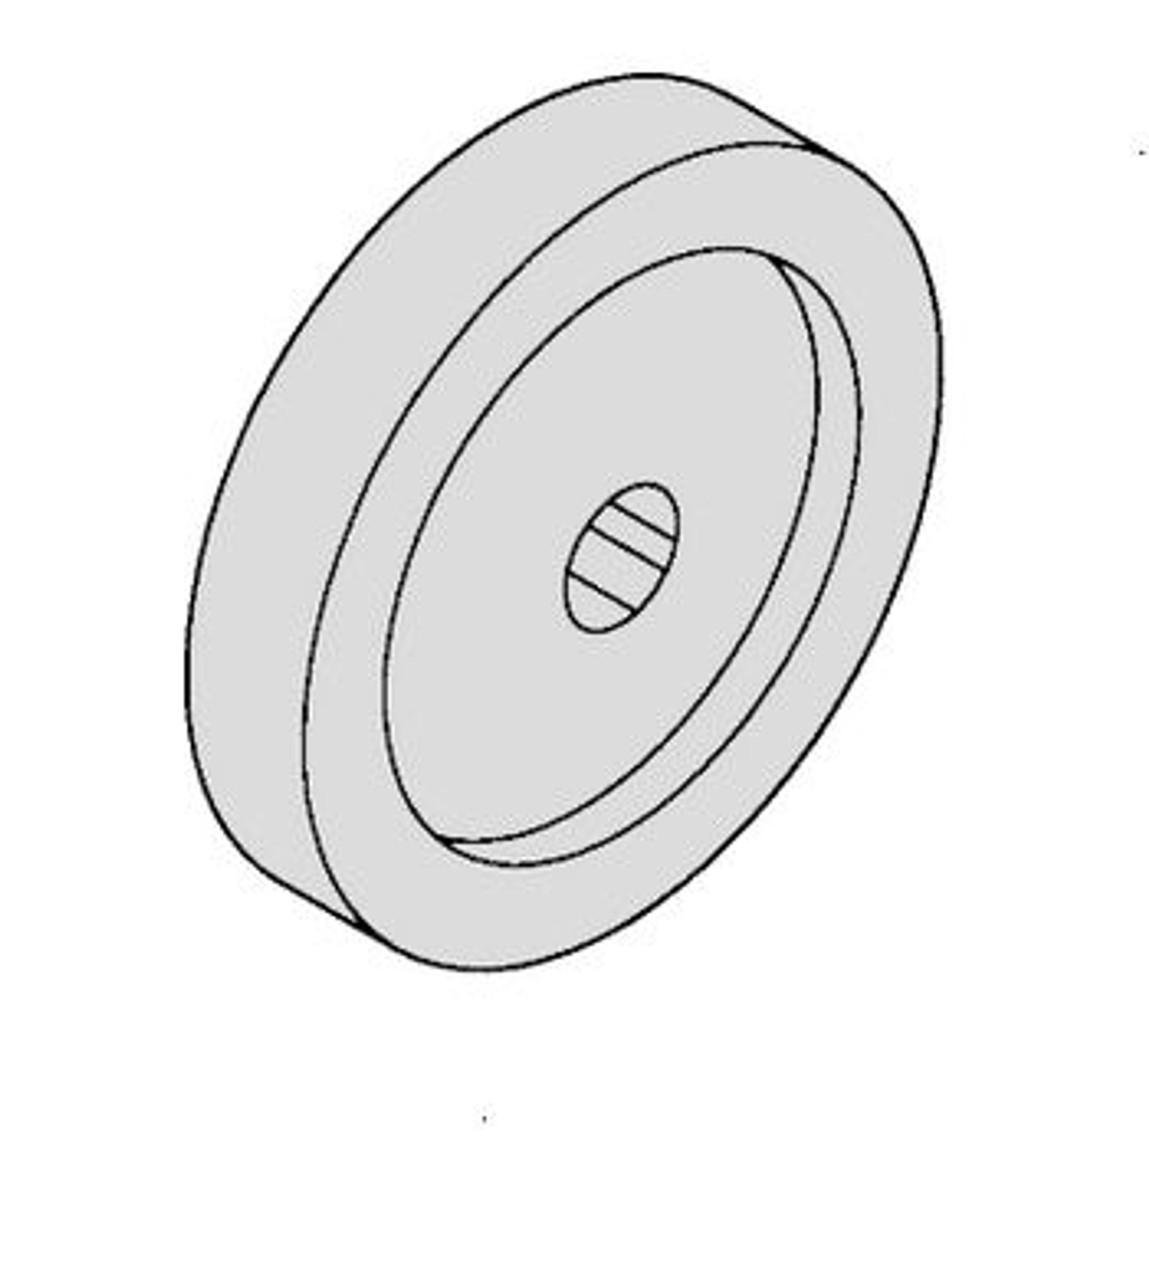 Hobart Grinding Stone 2612,2712,2812,2912 - HST-4